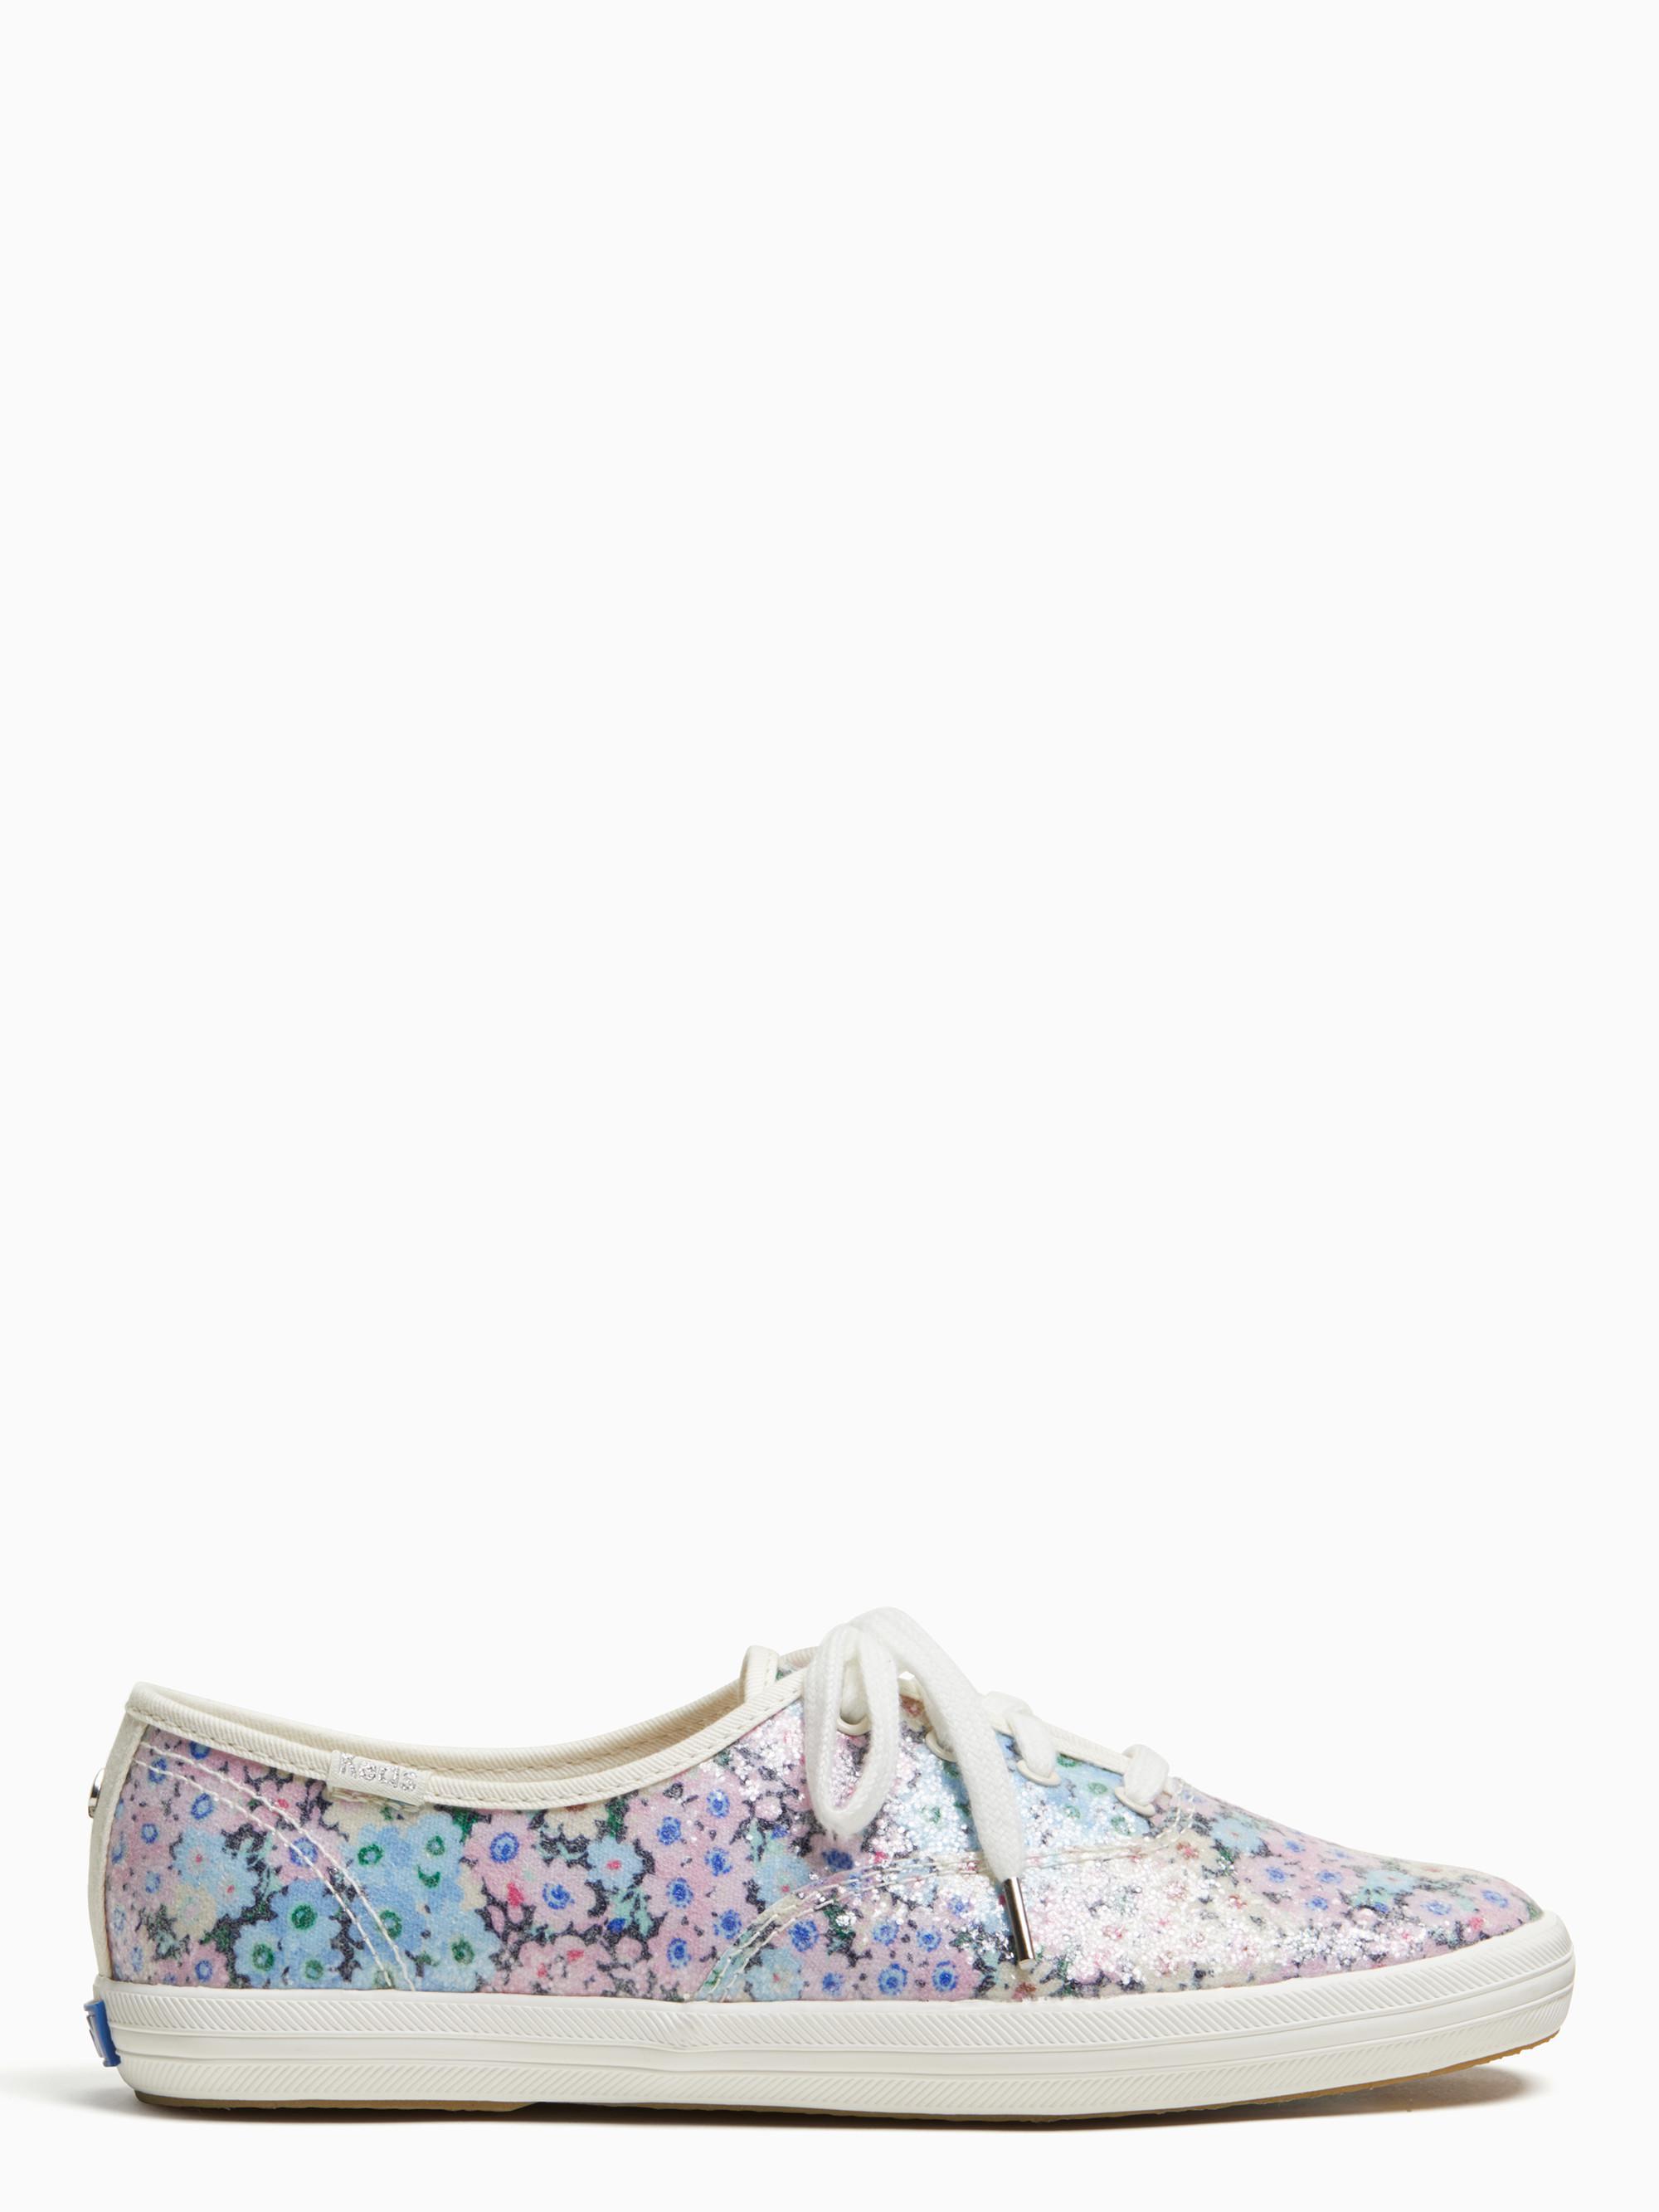 59df63eb388a Lyst - Kate Spade Keds X Champion Daisy Garden Glitter Sneakers